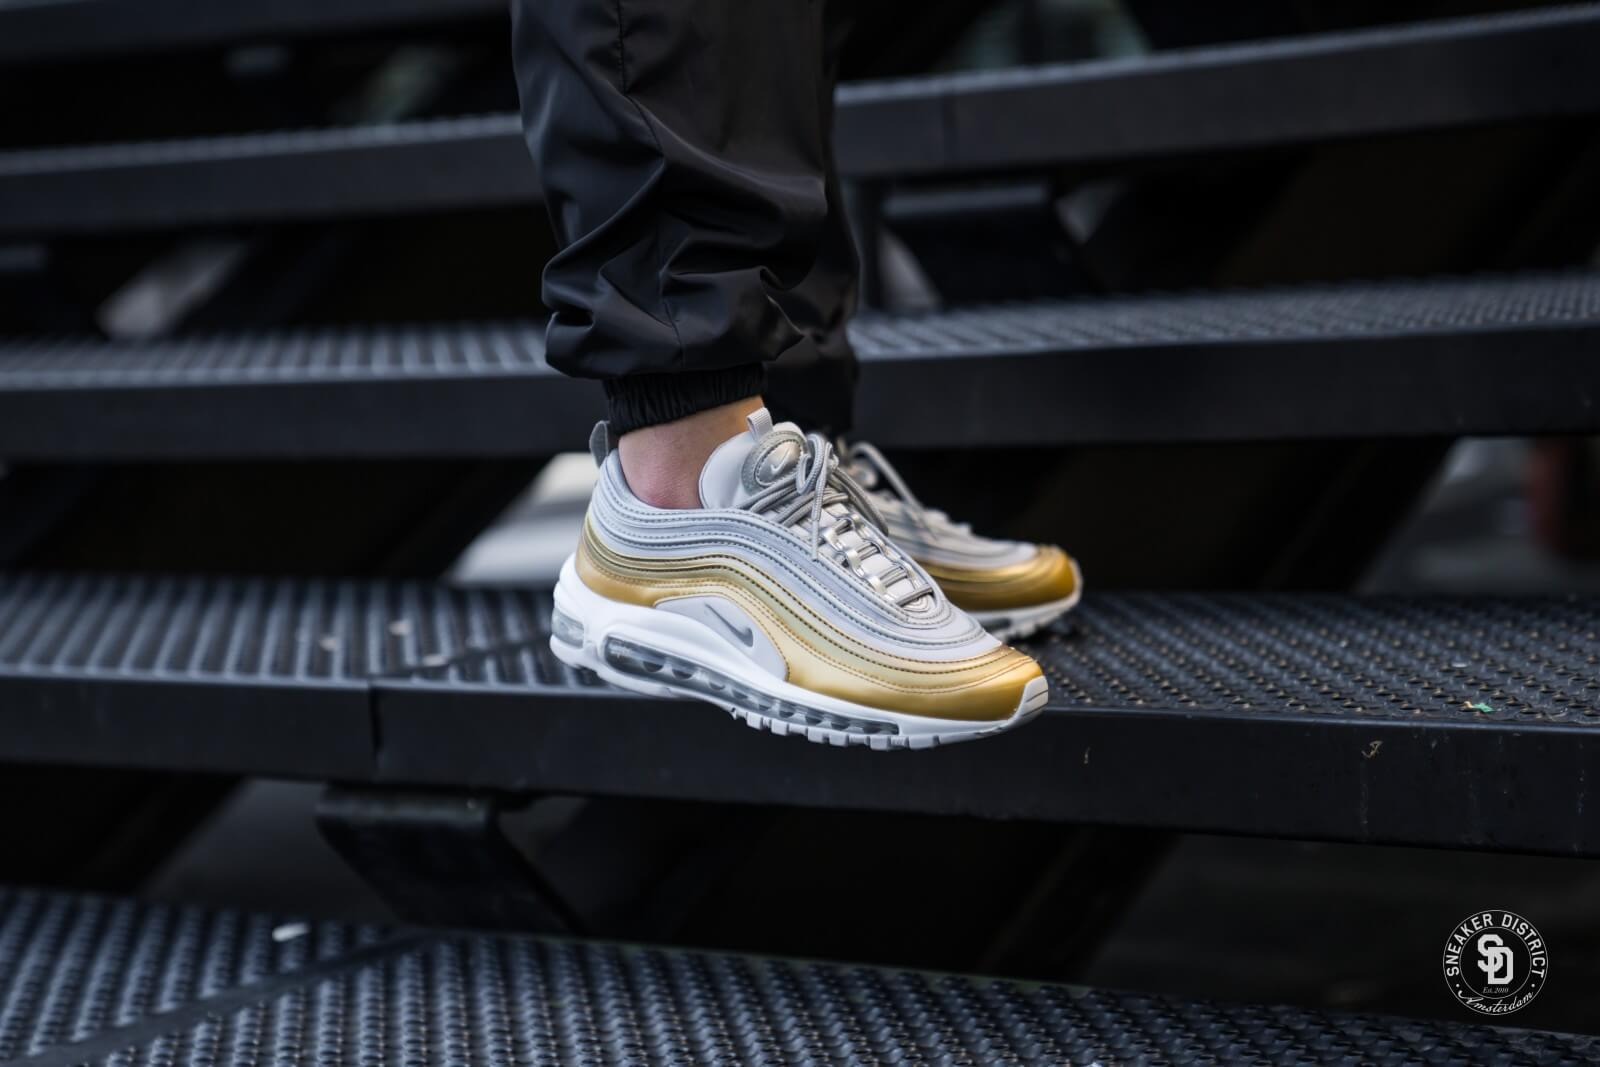 Nike Air Max 97 theSneaker.nl